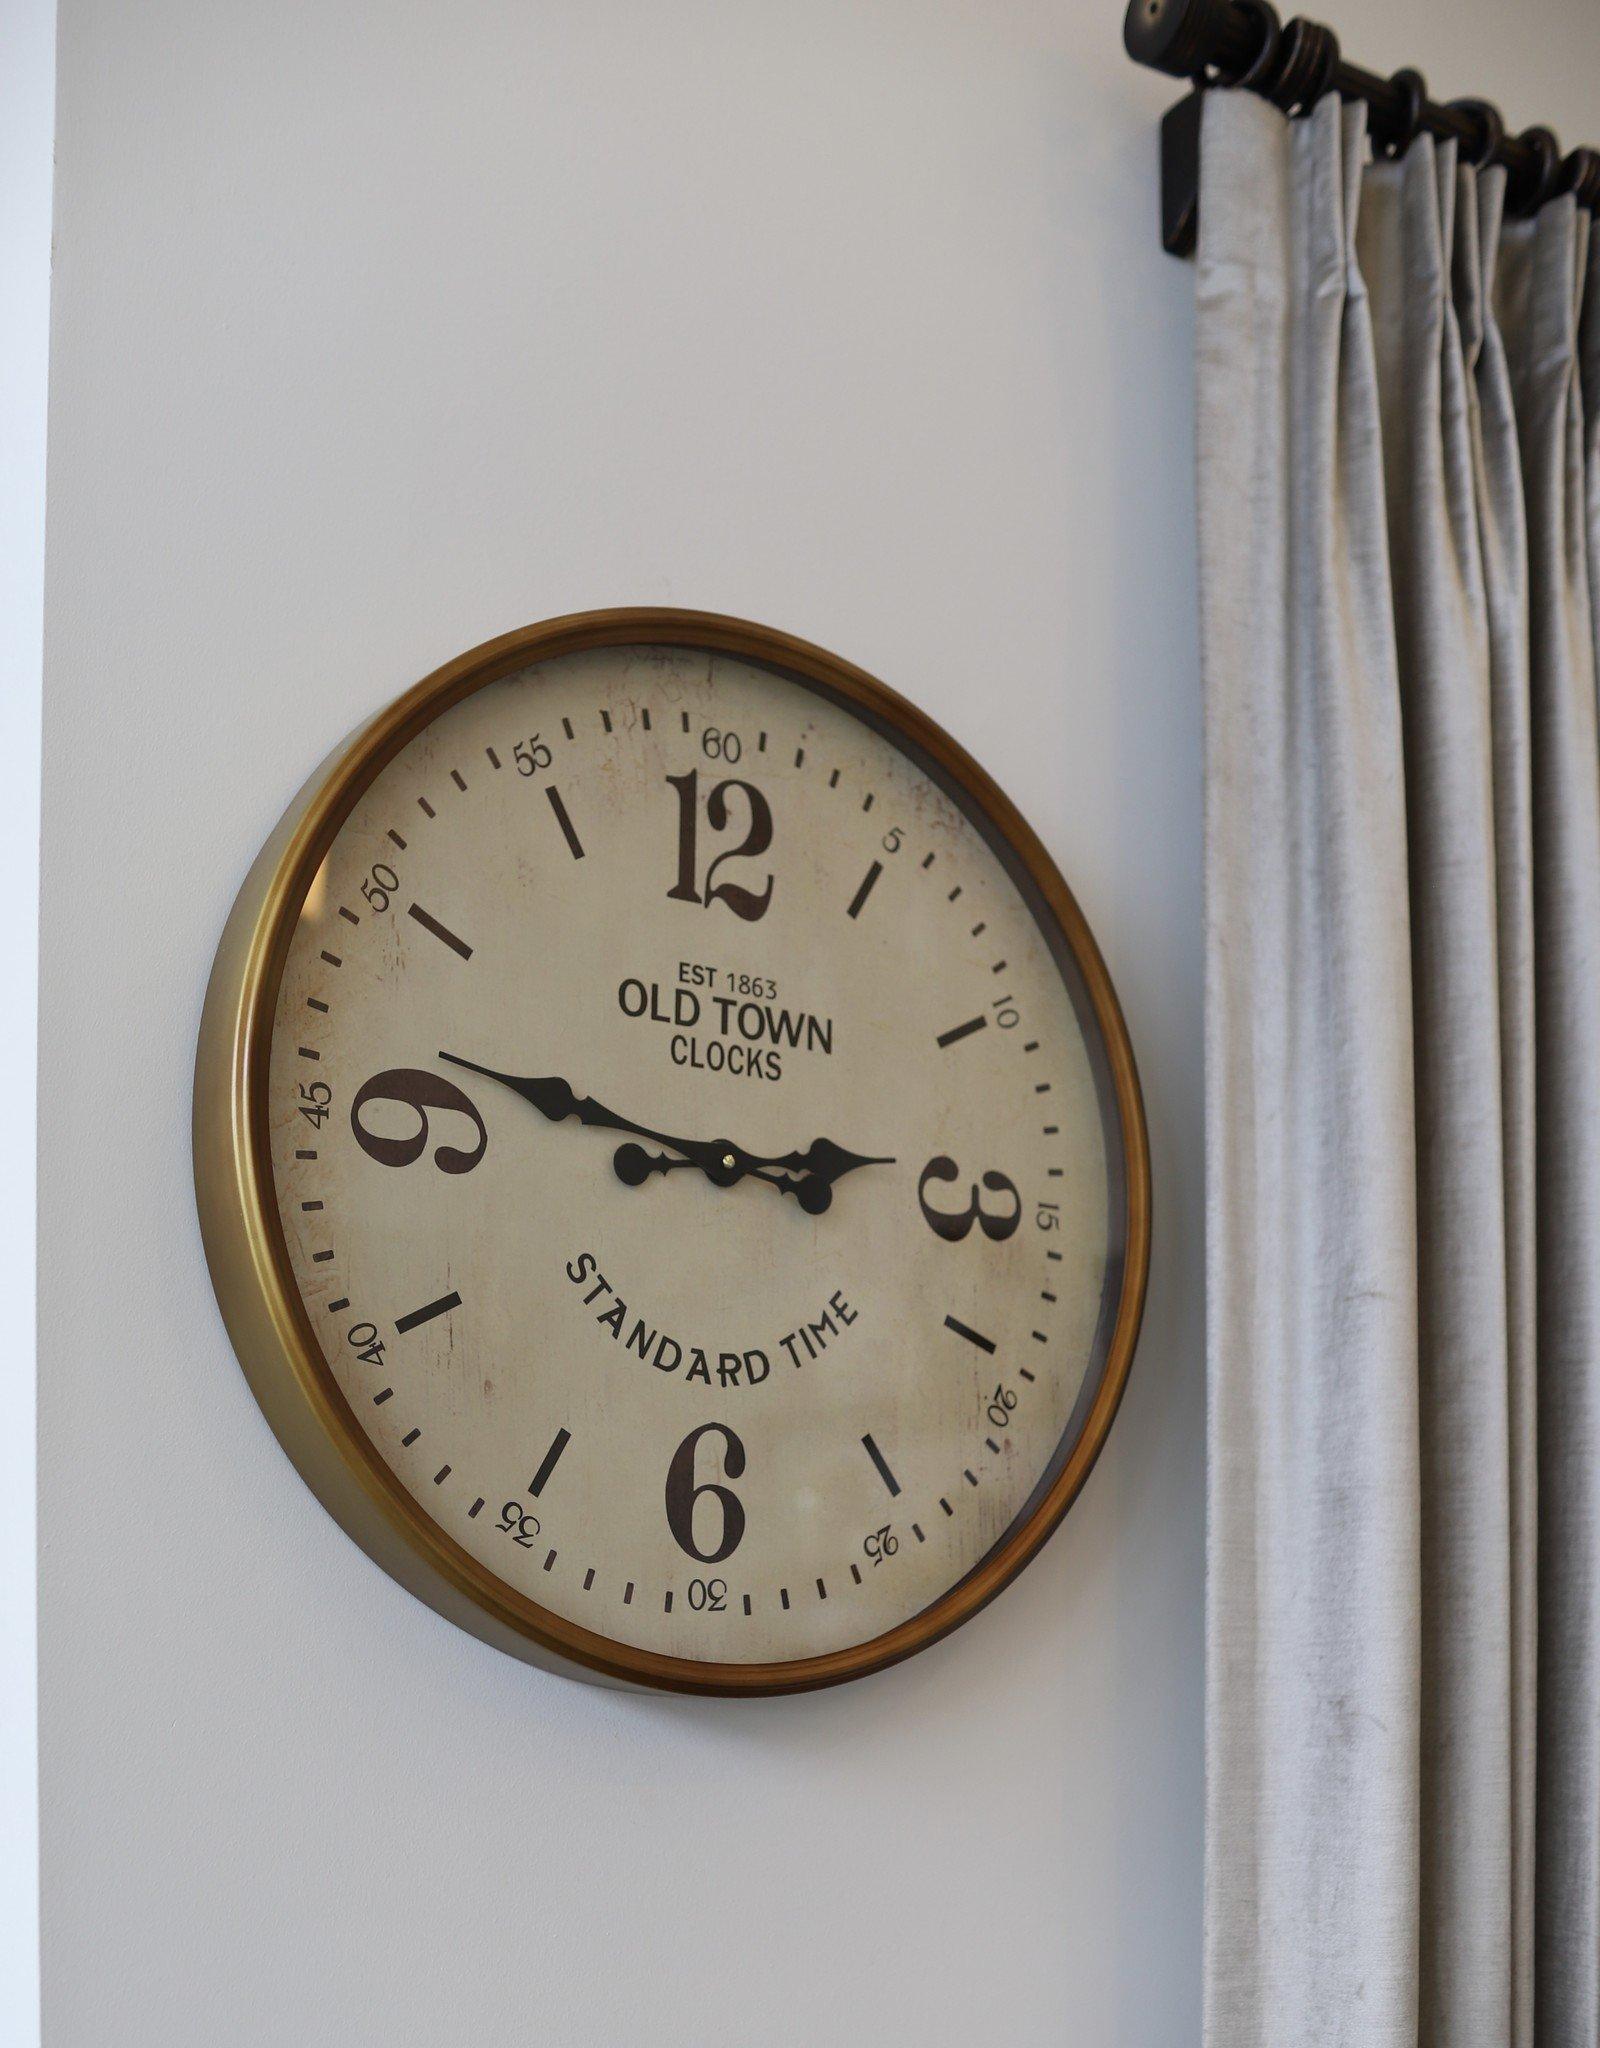 Lawrence Station Clock